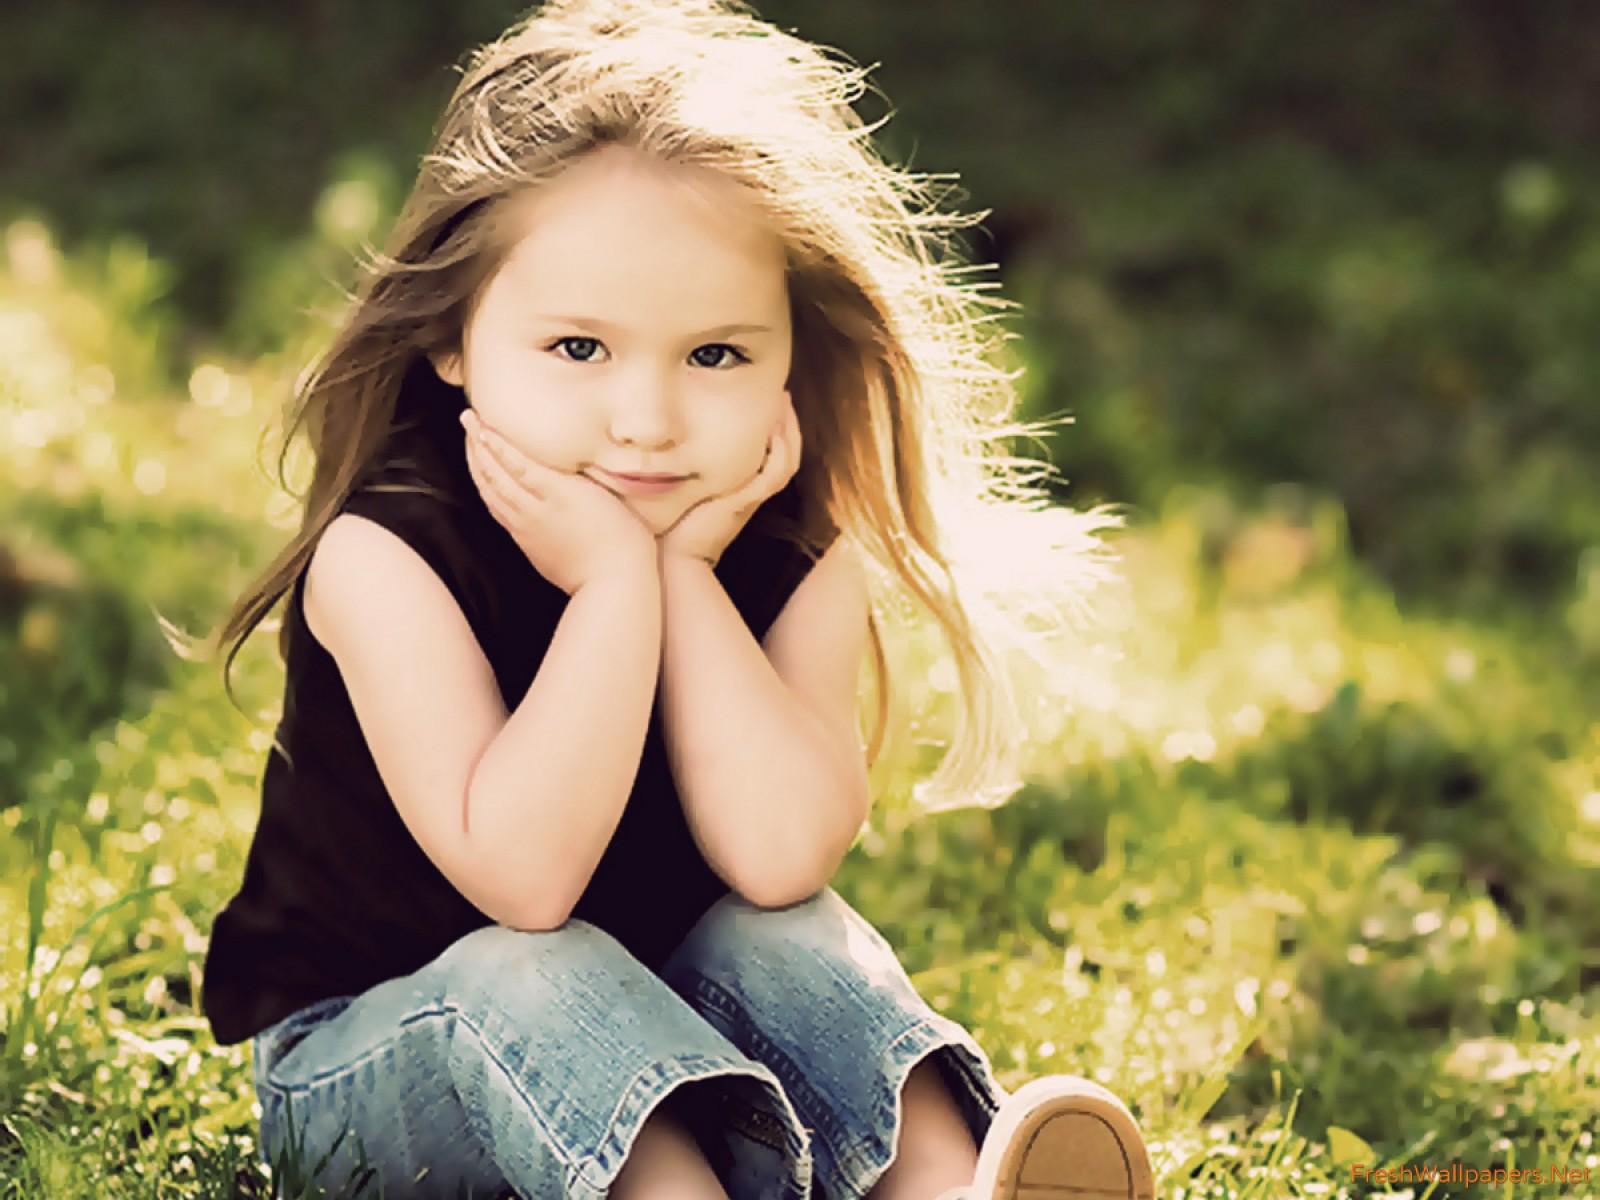 بالصور اجمل بنات اطفال , صور رائعه لاجمل اطفال 2505 12